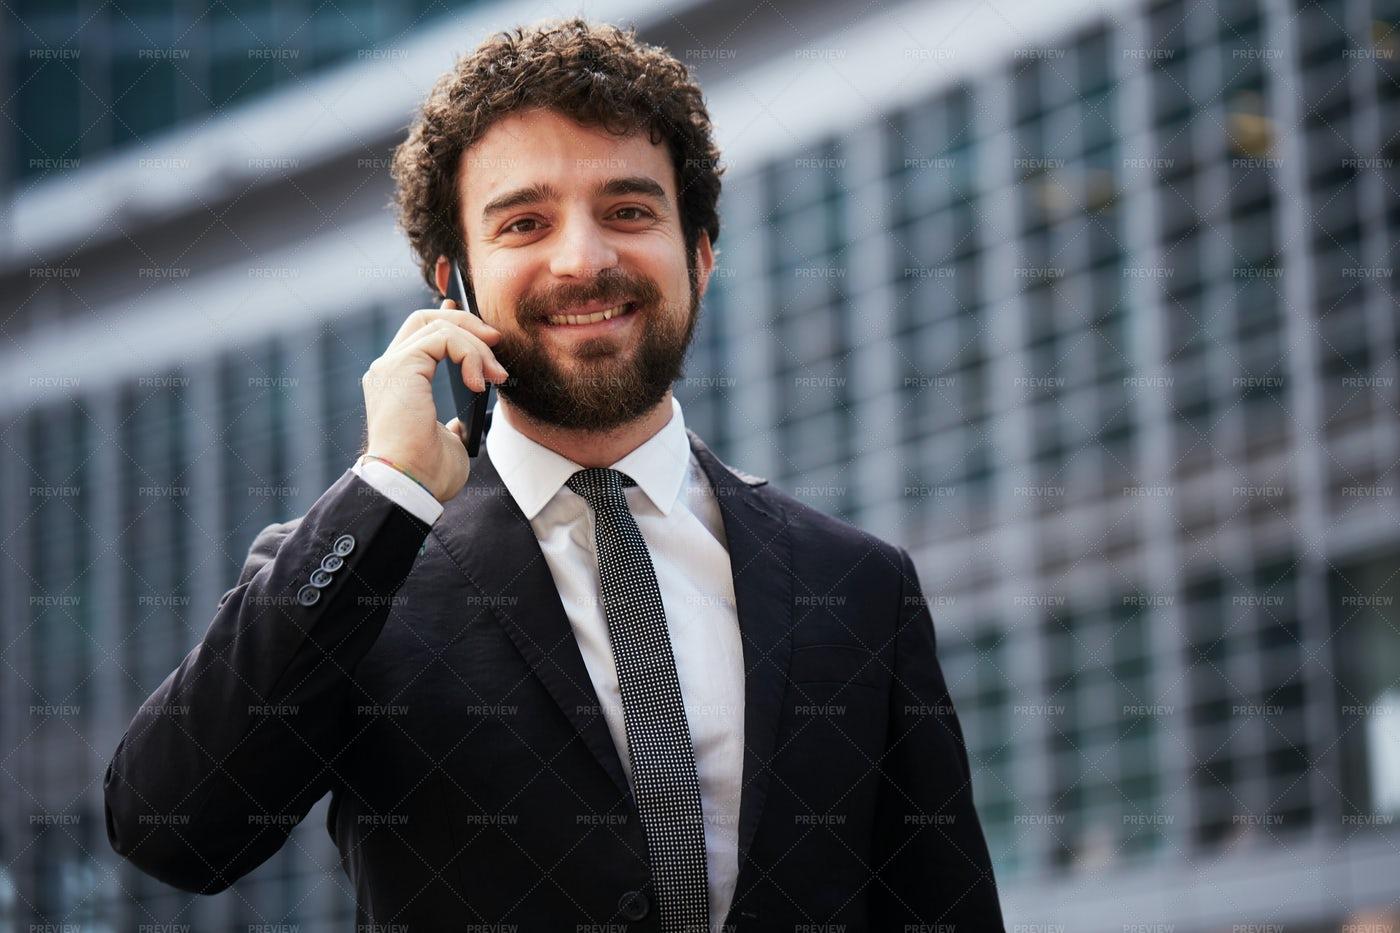 A Business Call: Stock Photos